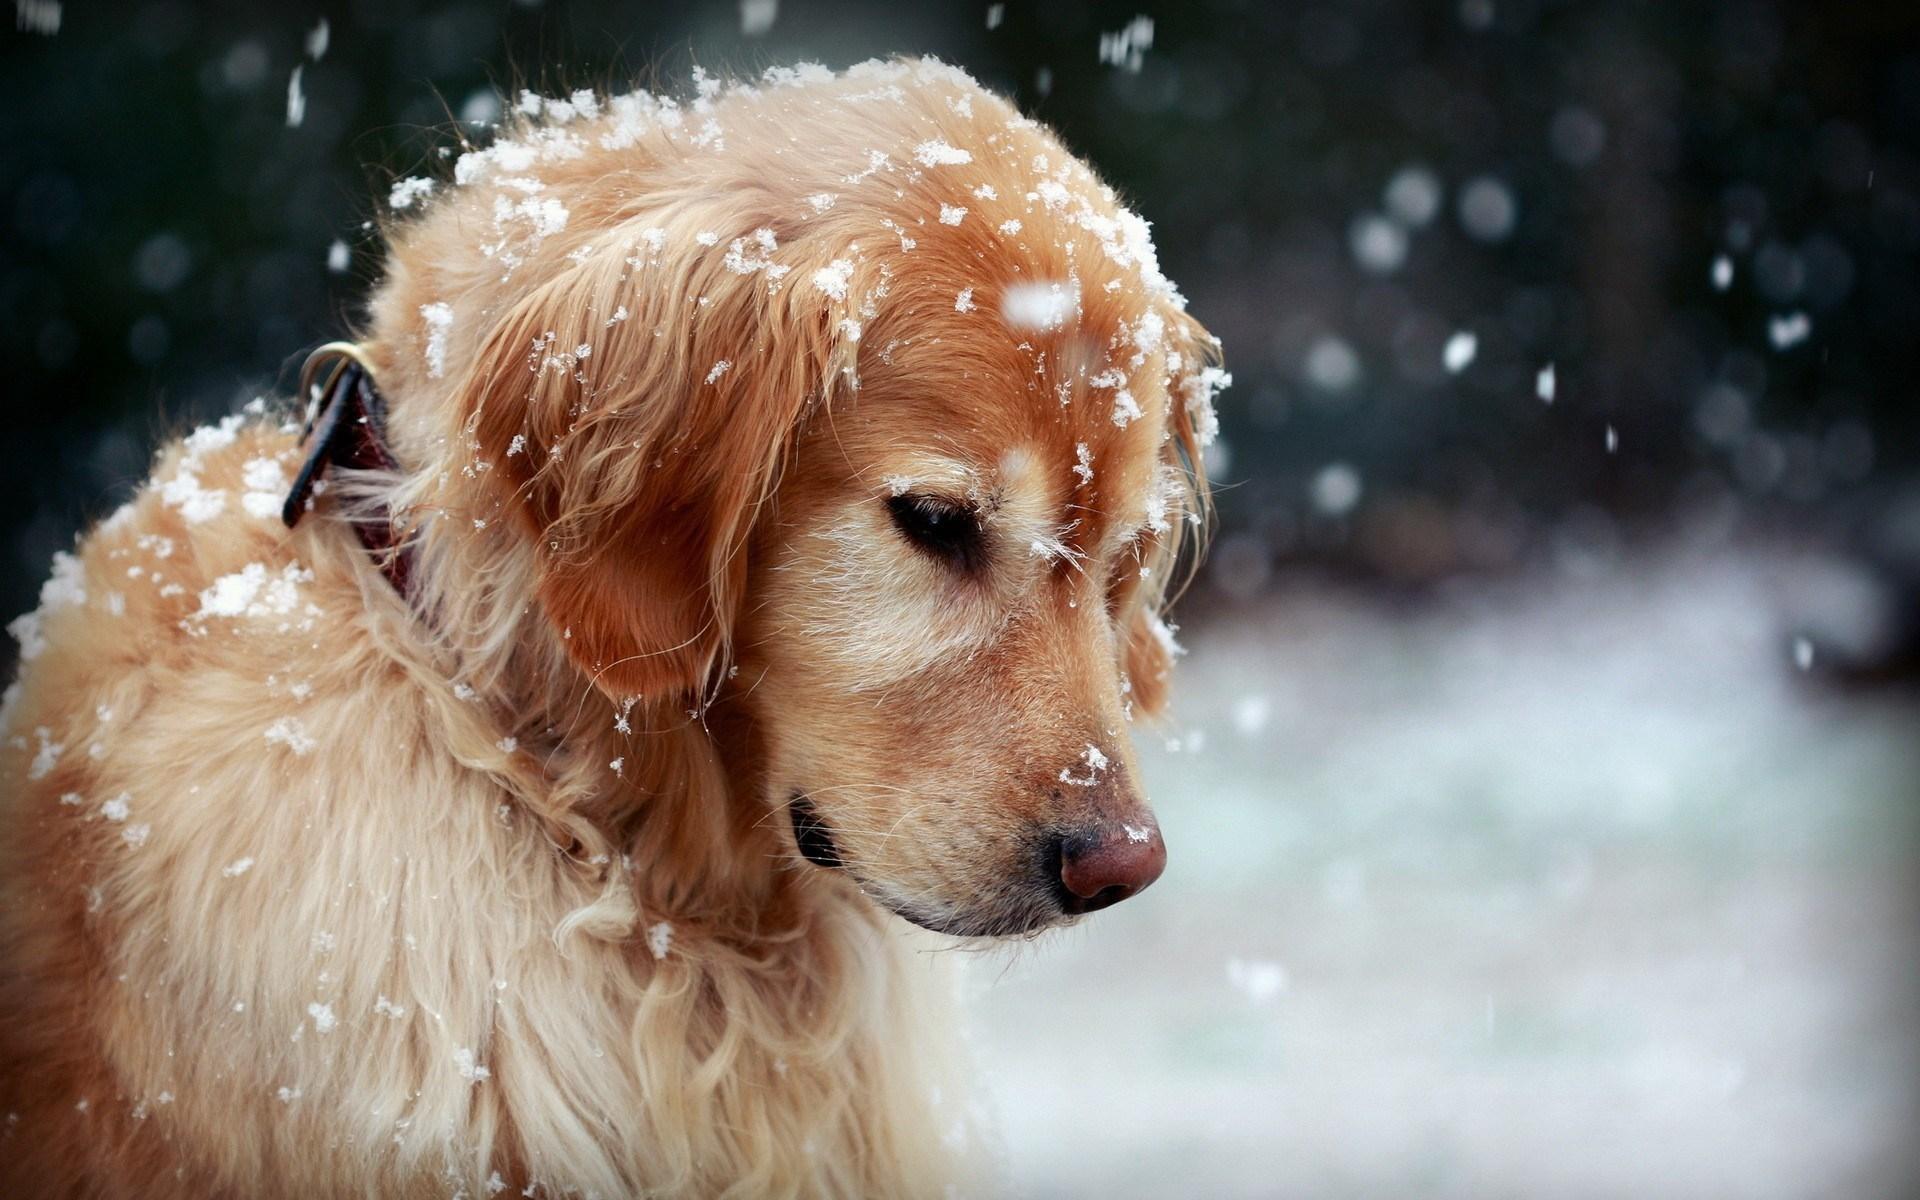 winter dog snowflakes hd wallpaper Dog wallpaper HD free wallpapers 1920x1200